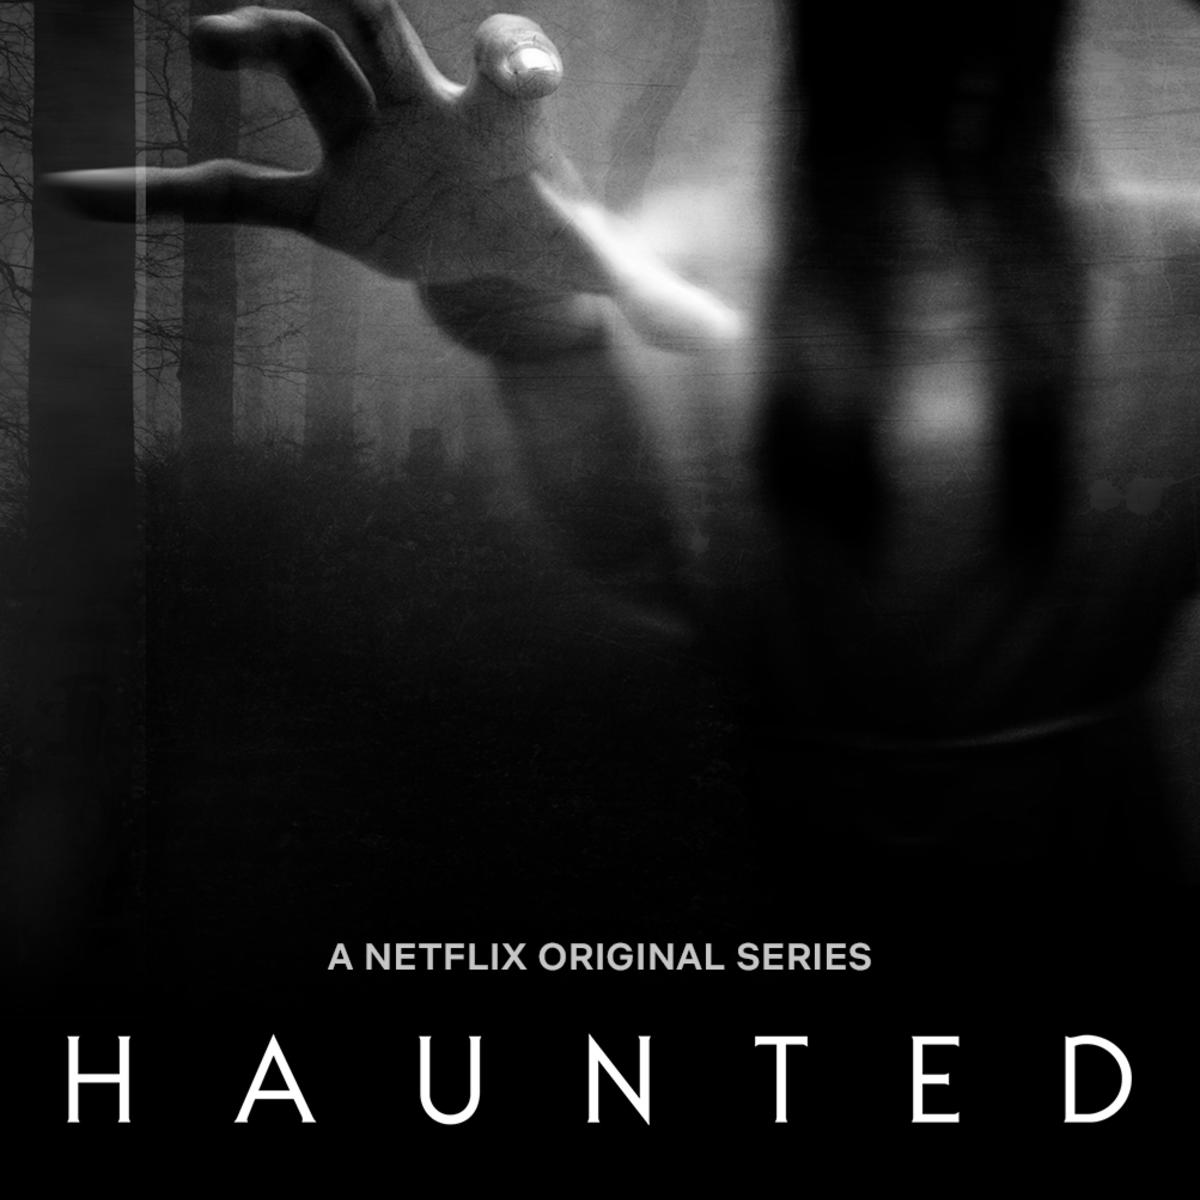 Netflix Haunted Poster